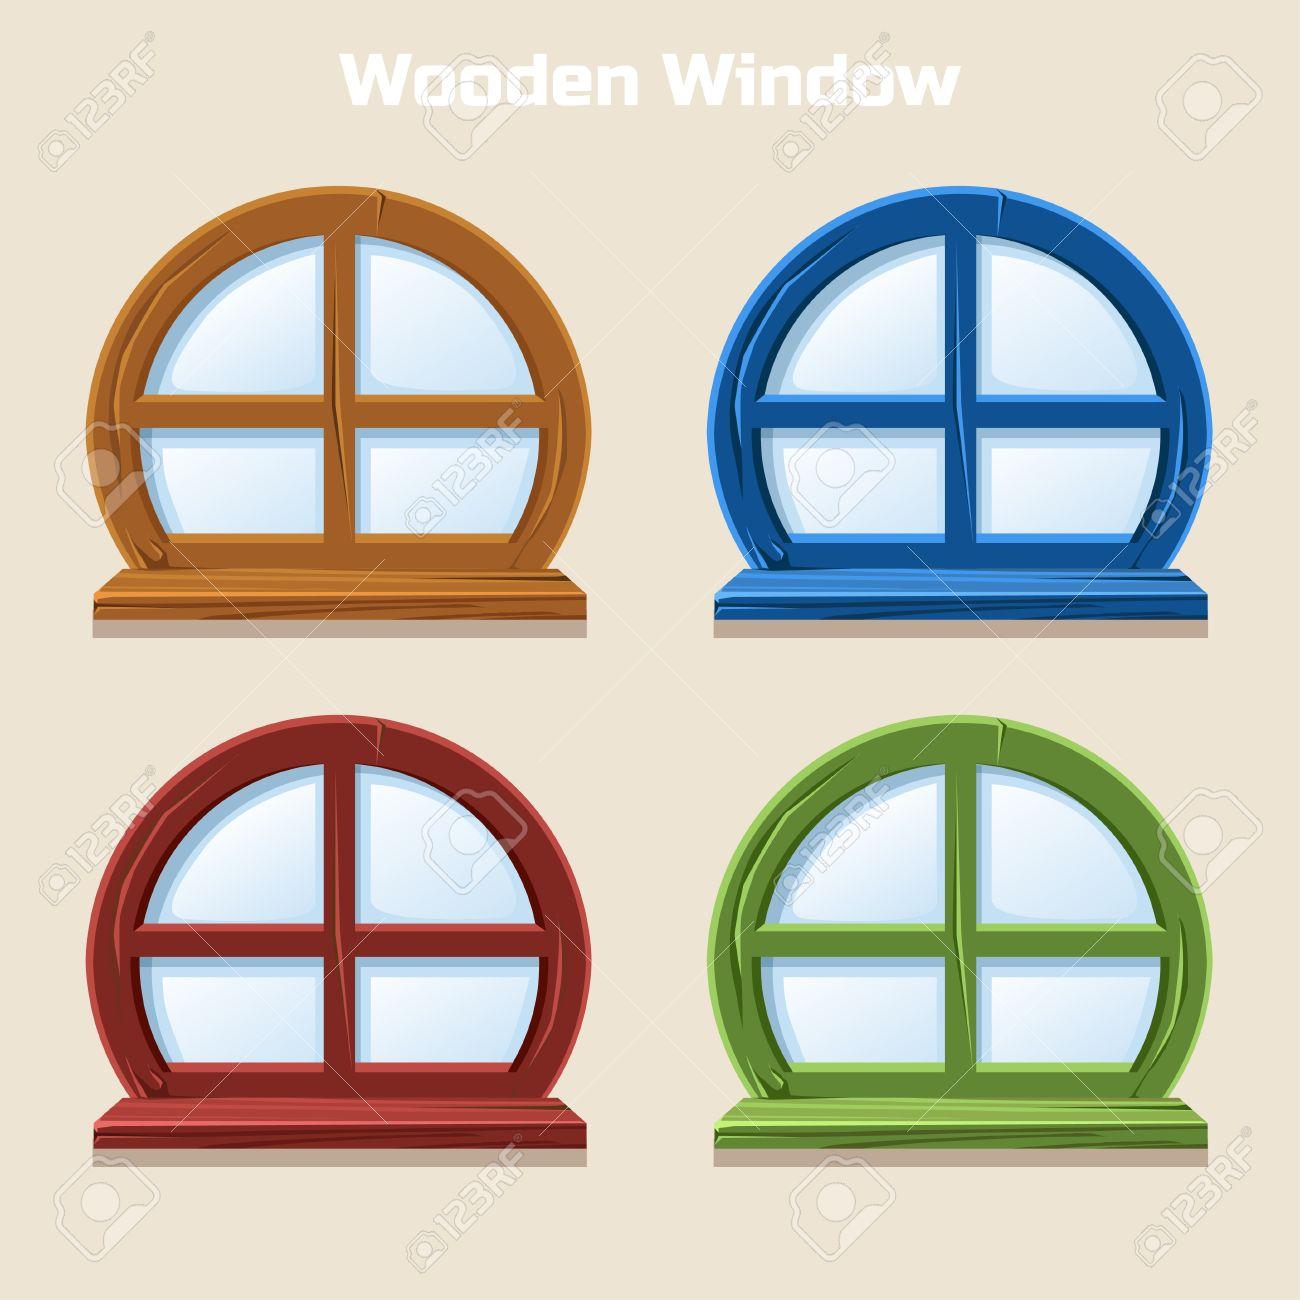 Interior wooden shelves free vector - Cartoon Wooden Round Colorful Window Home Interior In Vector Stock Vector 62210969